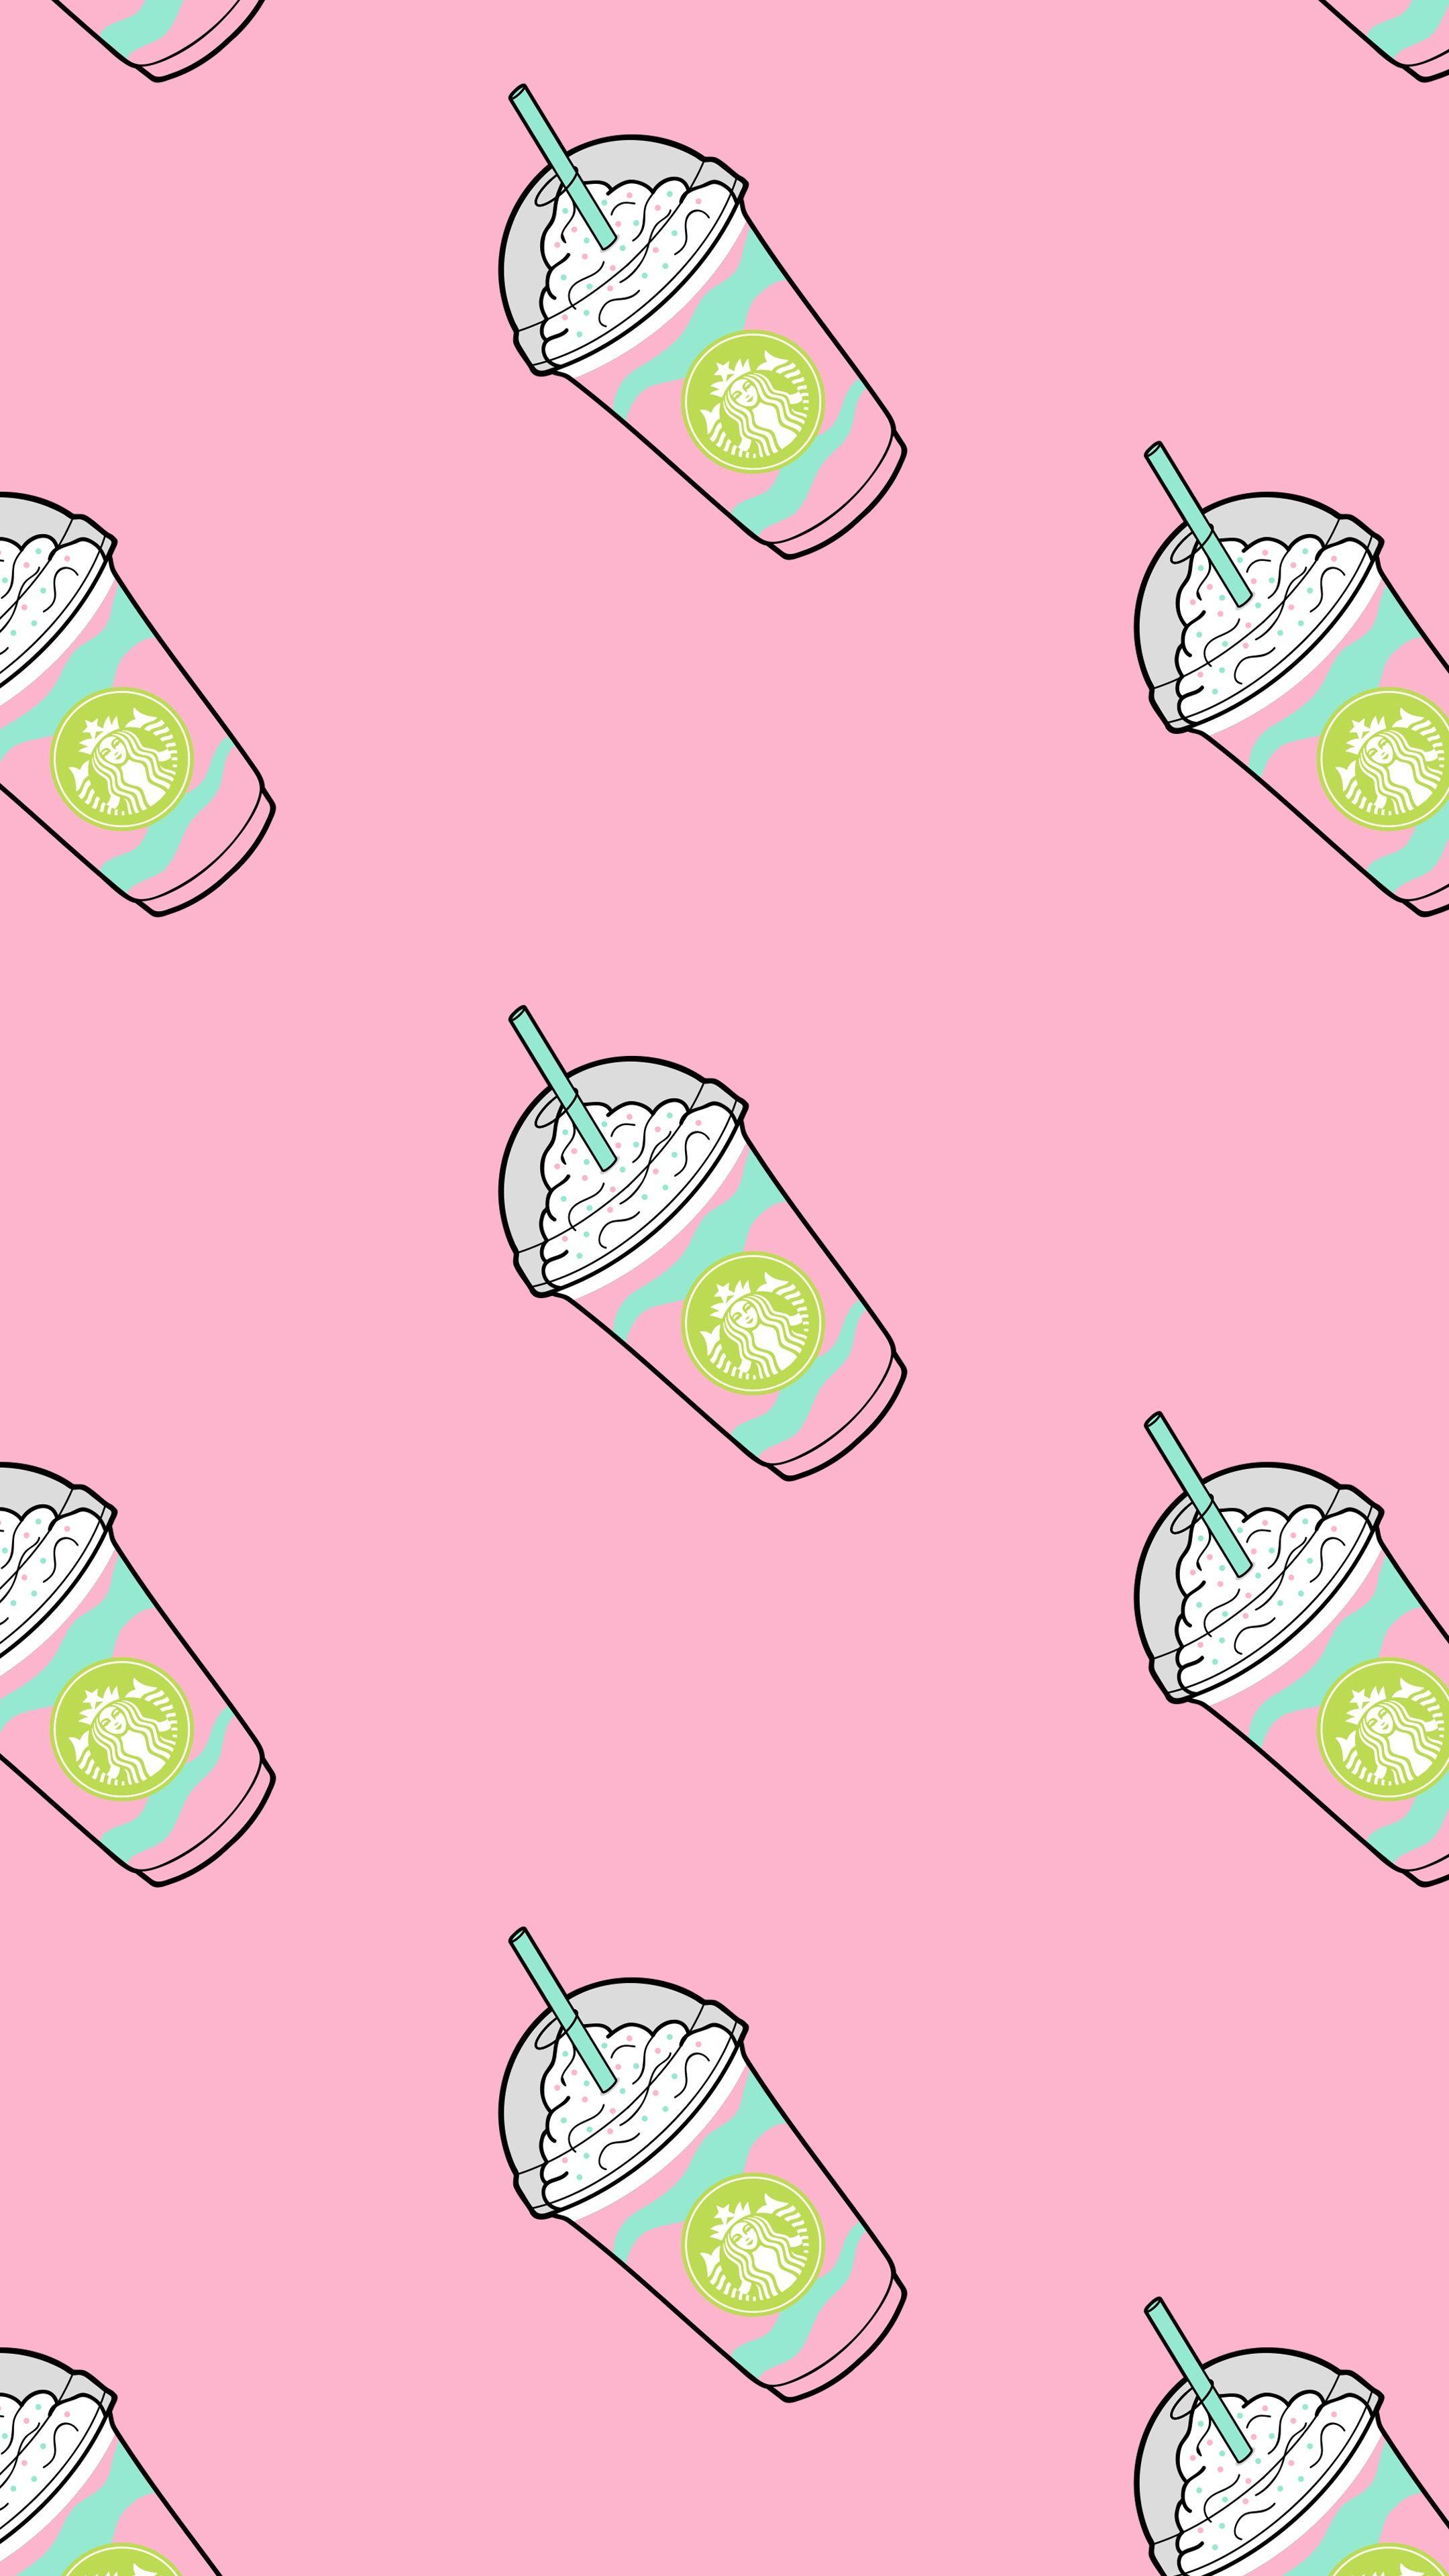 Pin by Leah on KaleidO Spongebob wallpaper, Cute food